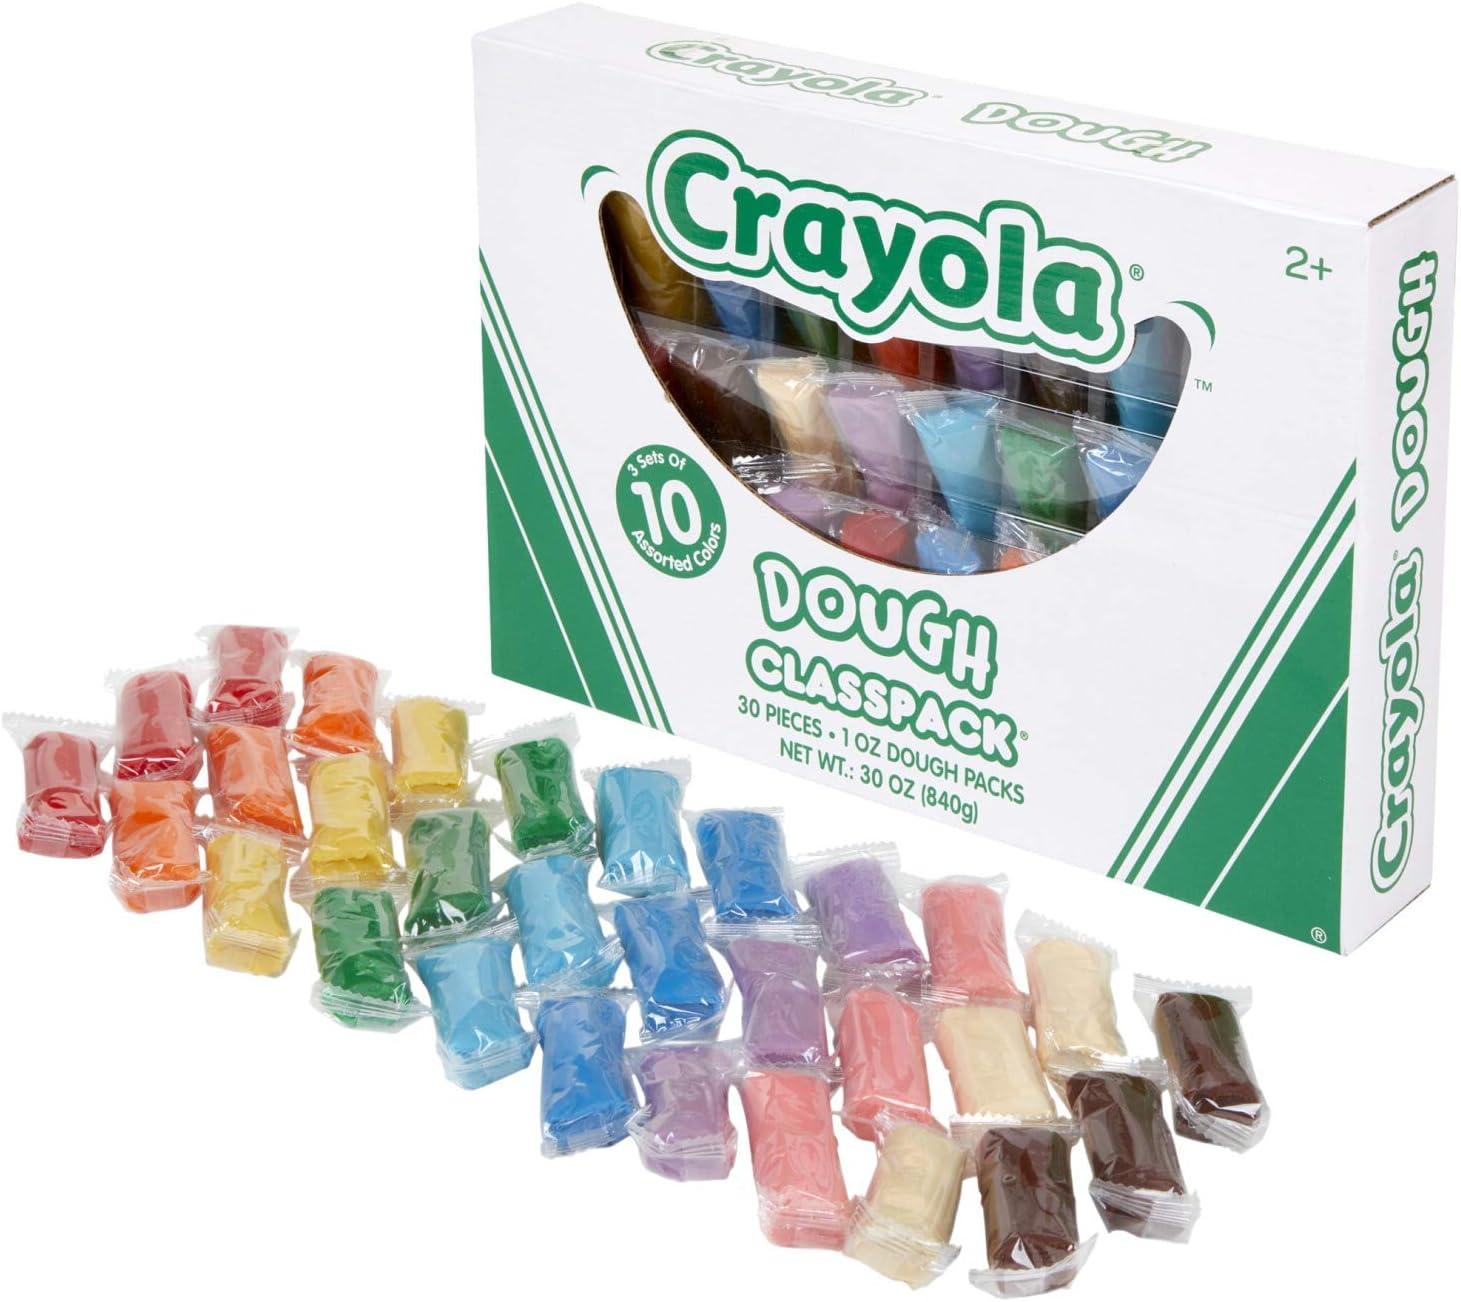 10 Assorted Colors 30 Sets of 10 Packs 1oz per Pack Crayola Dough Classpack Art Supplies